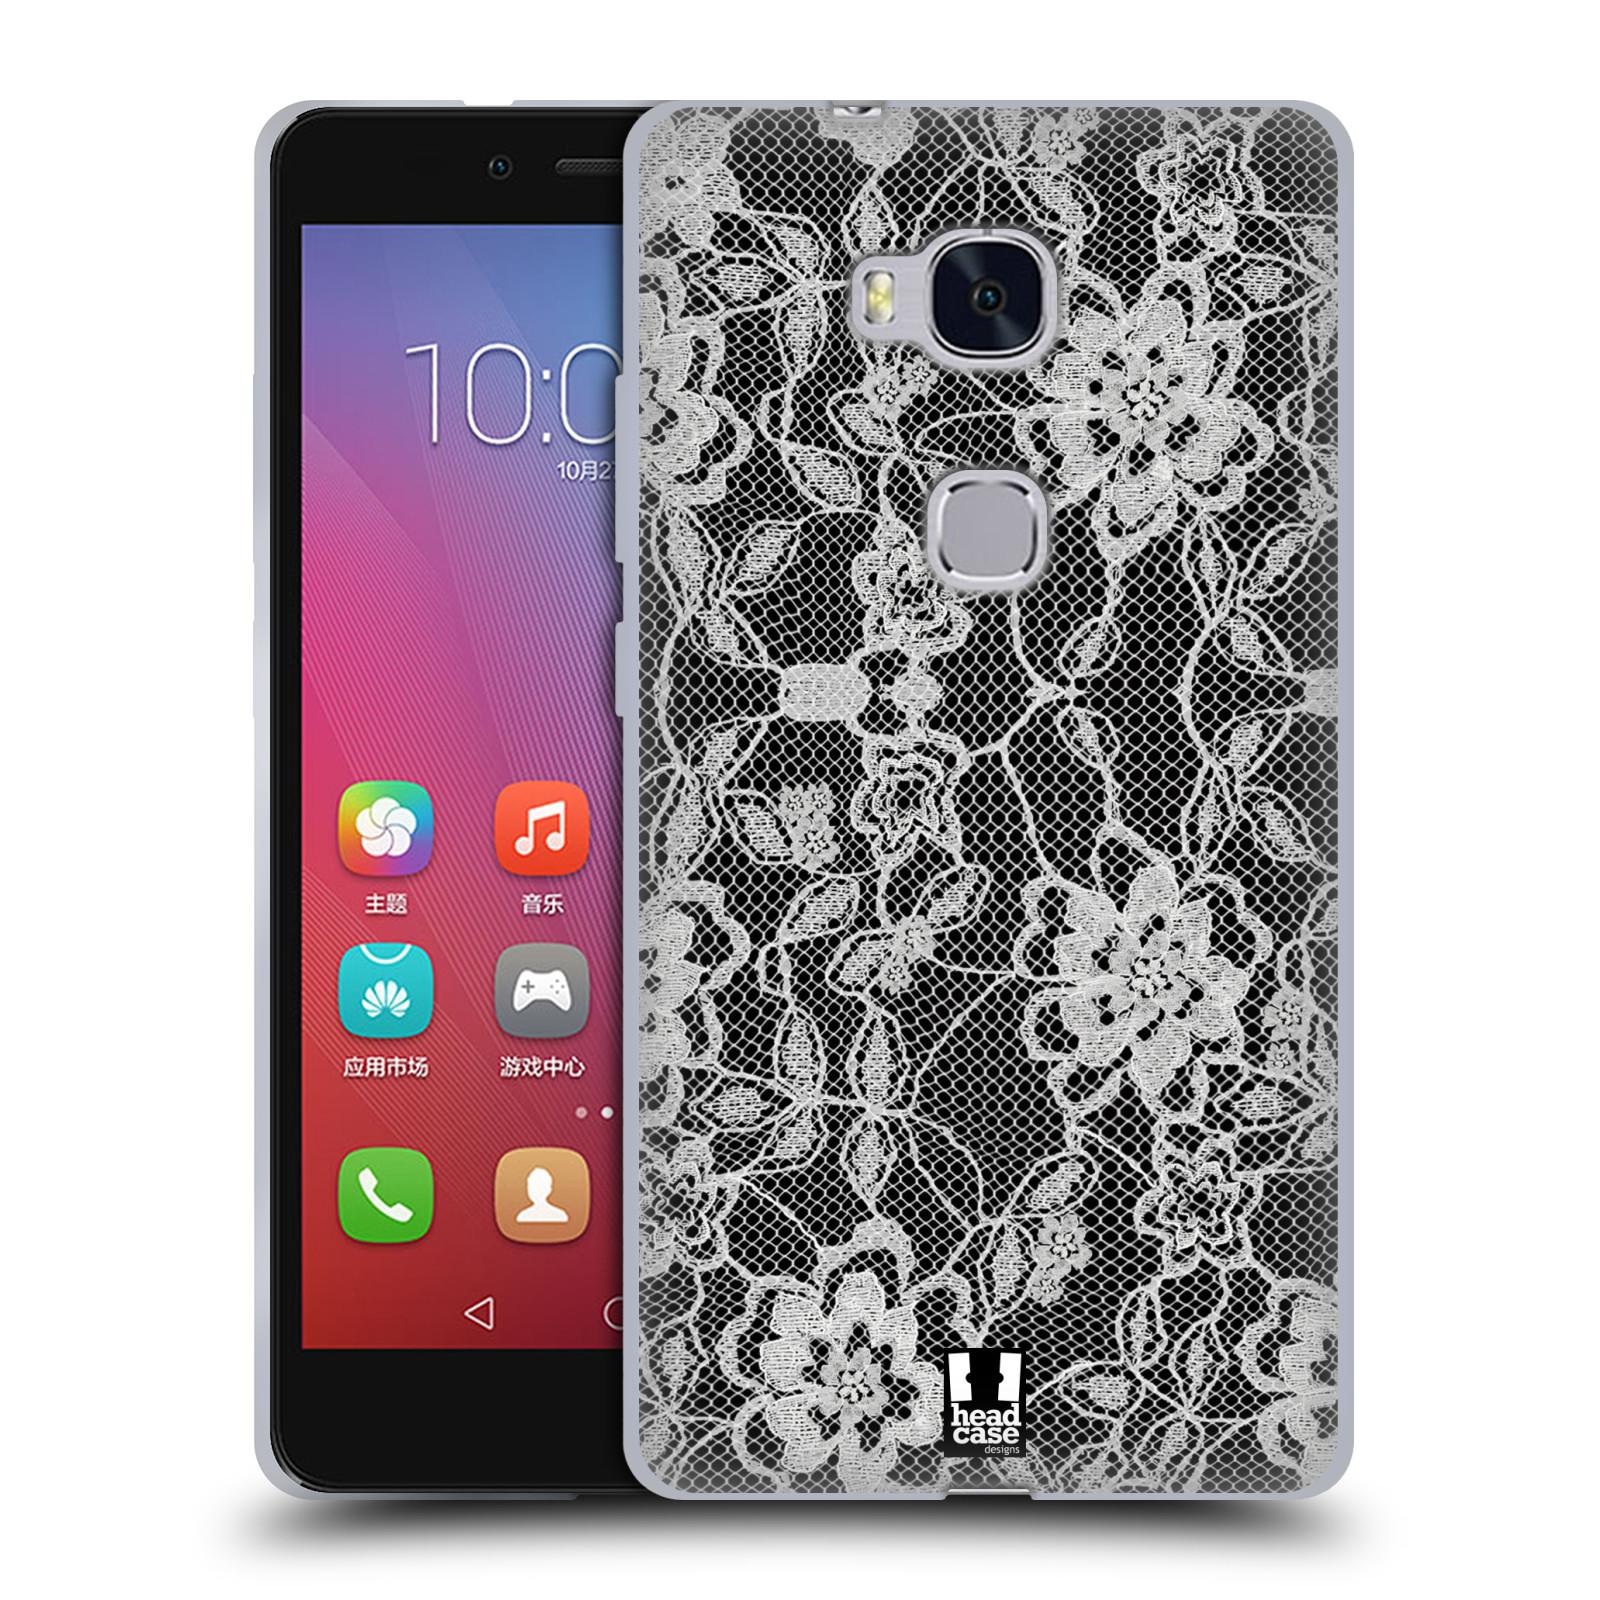 Silikonové pouzdro na mobil Honor 5X HEAD CASE FLOWERY KRAJKA (Silikonový kryt či obal na mobilní telefon Huawei Honor 5X)